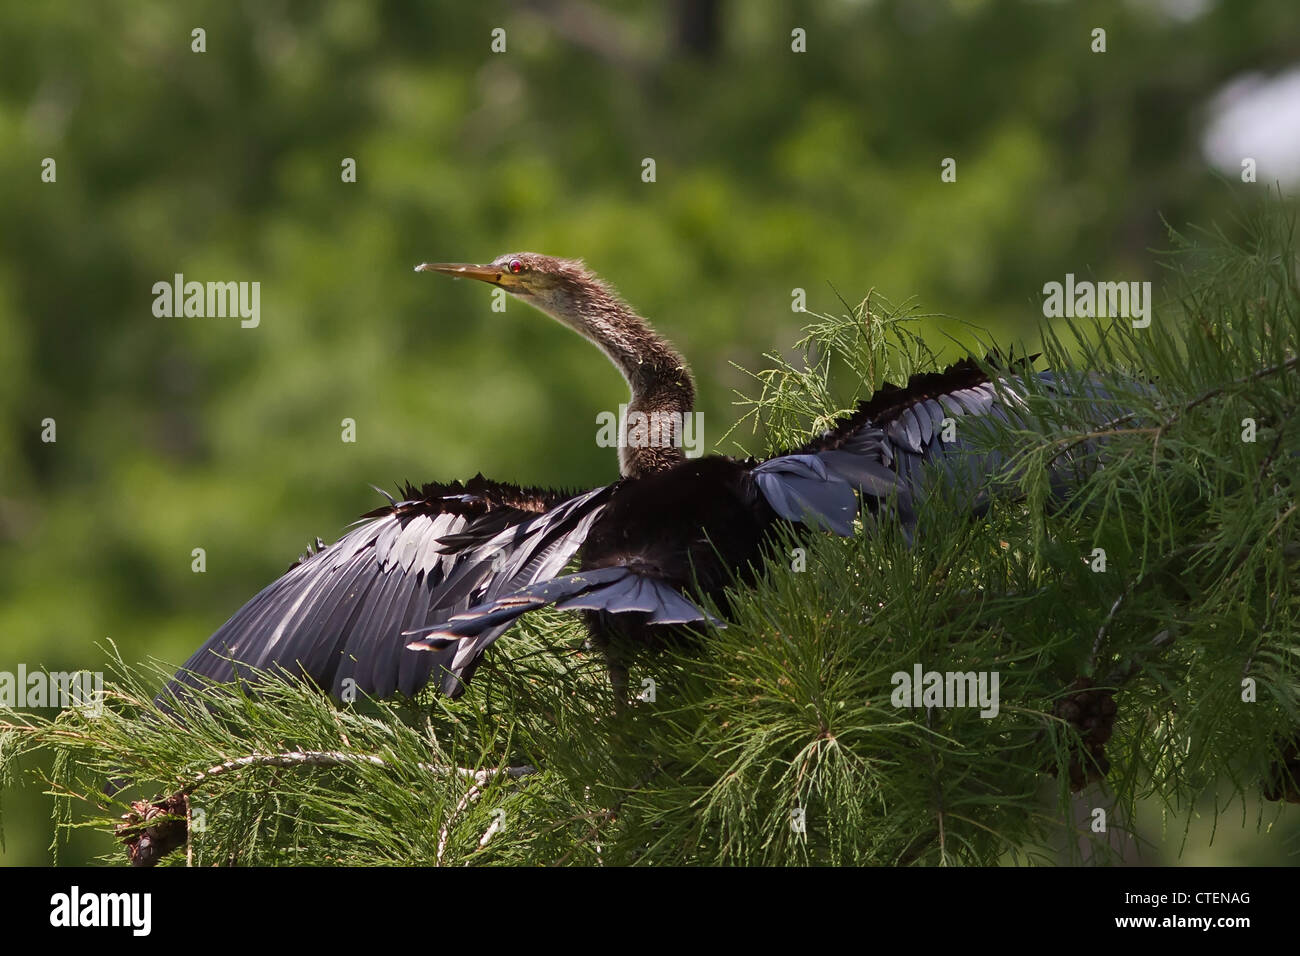 Anhinga sunning spreading its wings - Stock Image